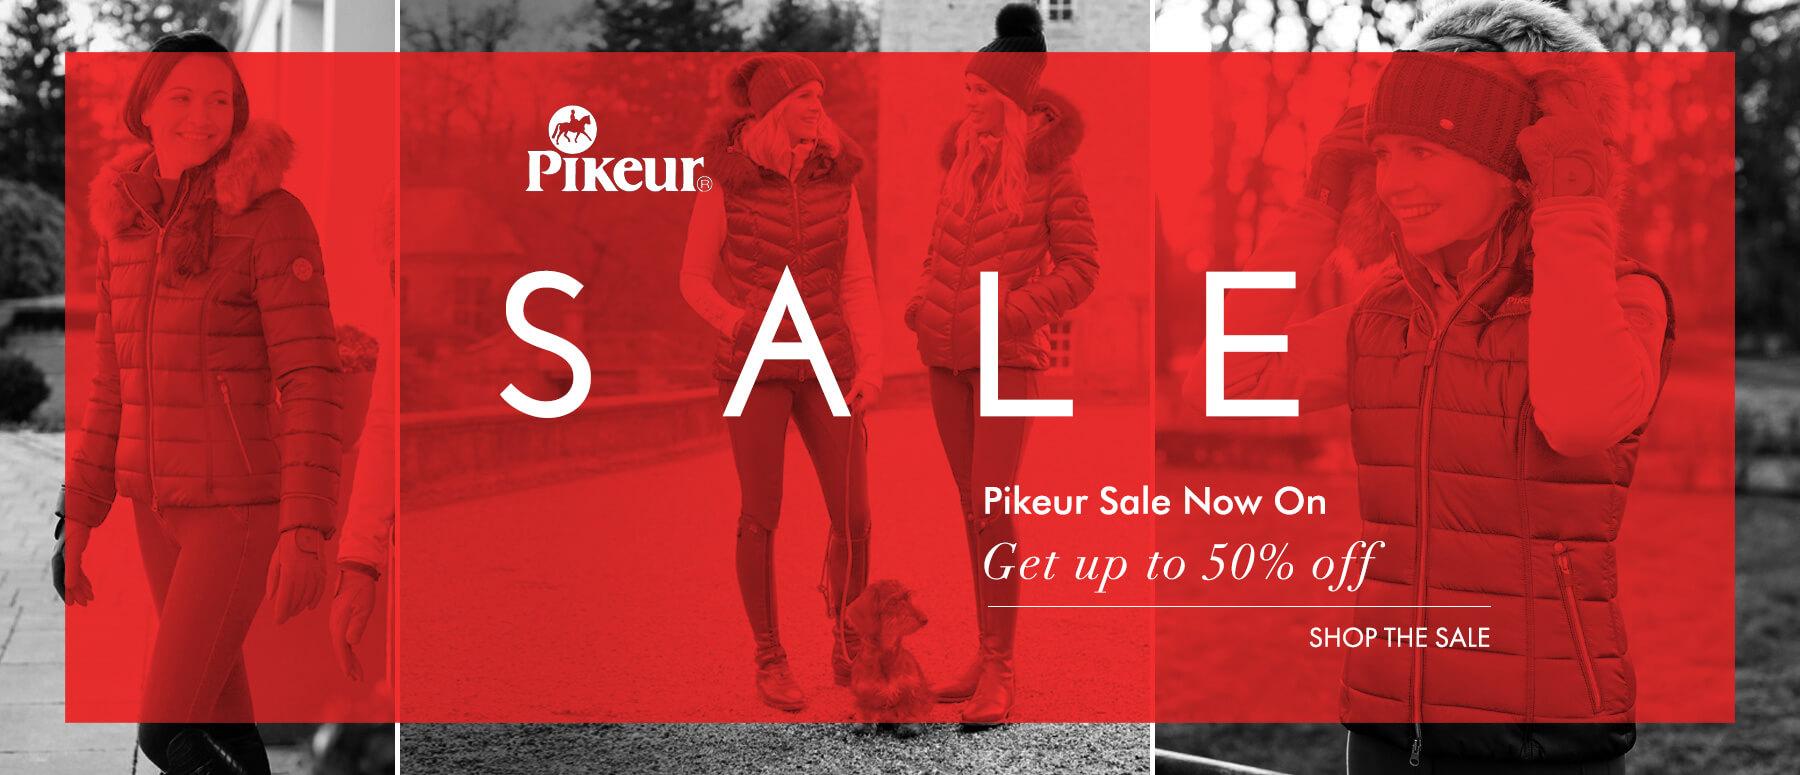 Pikeur Brand Page